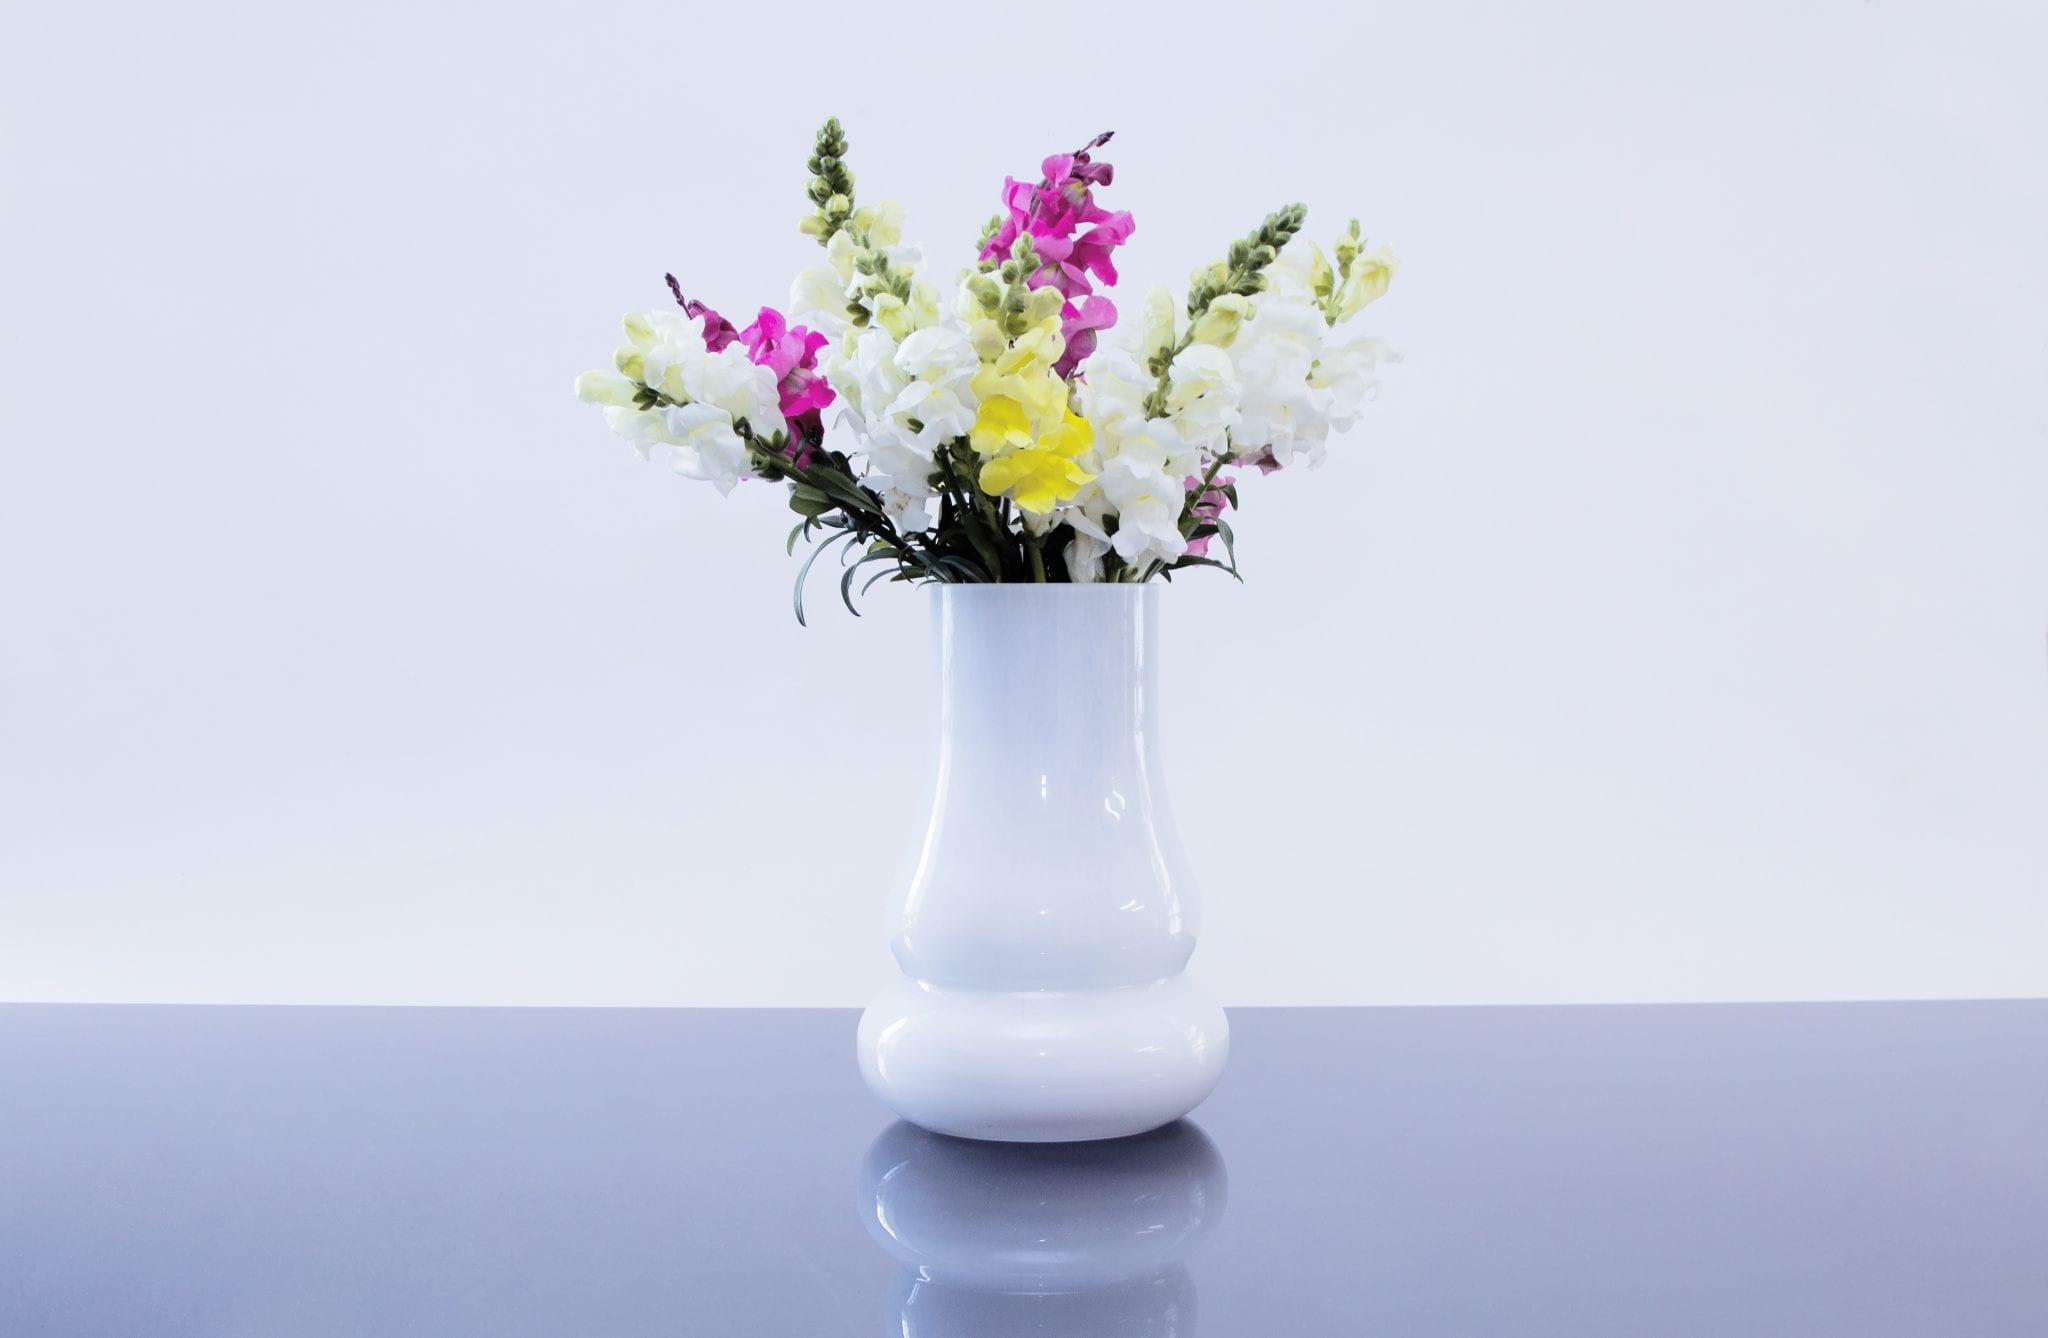 Milky White Glass Vase